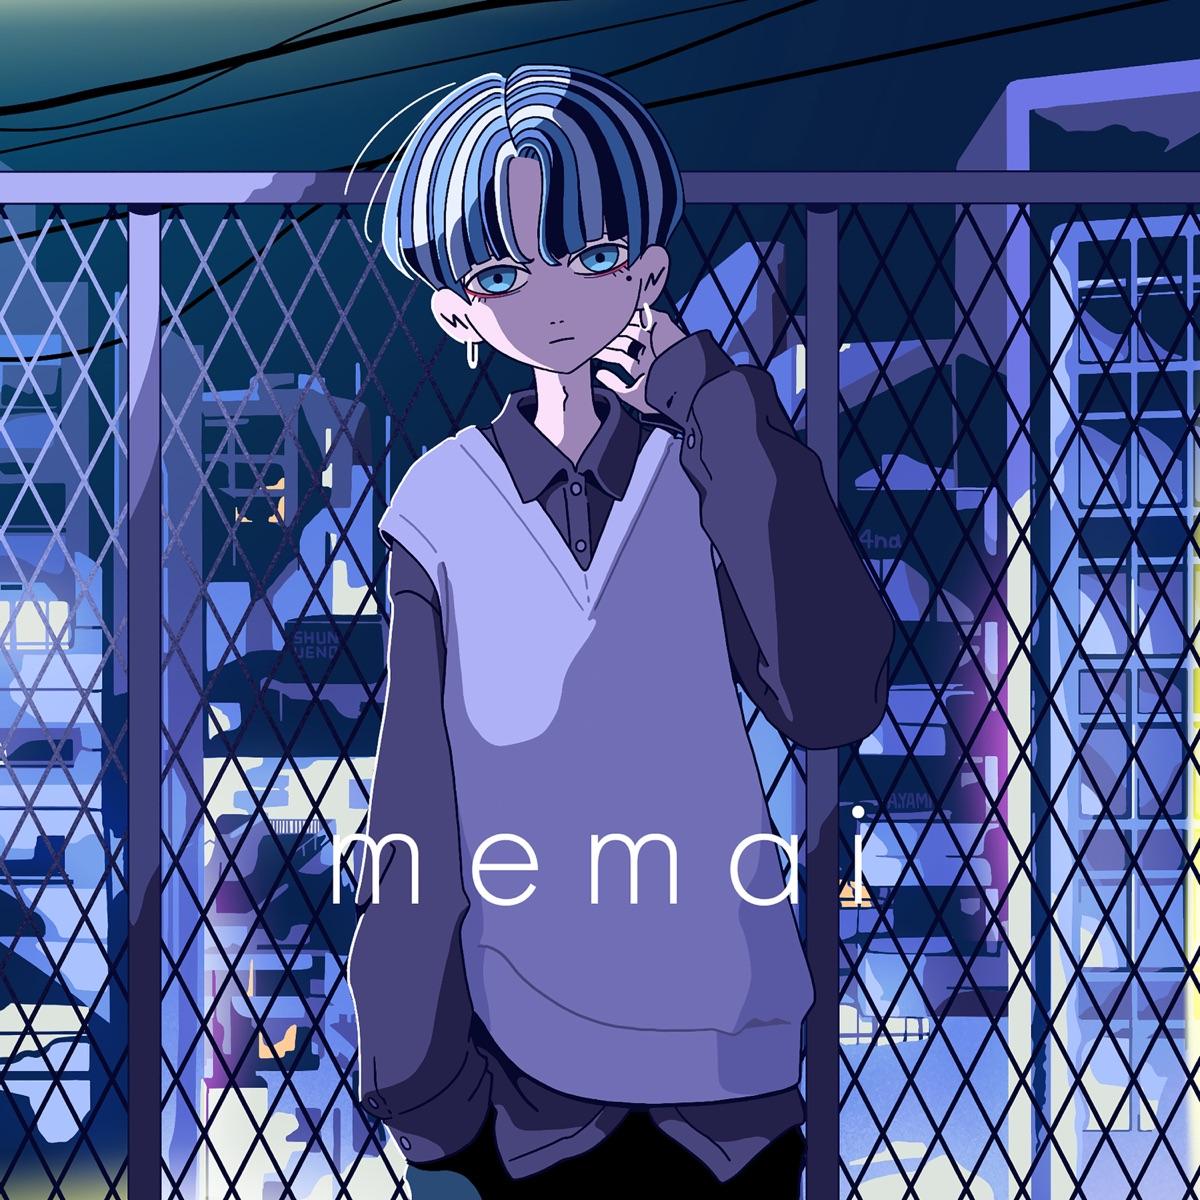 『4na - memai』収録の『memai』ジャケット